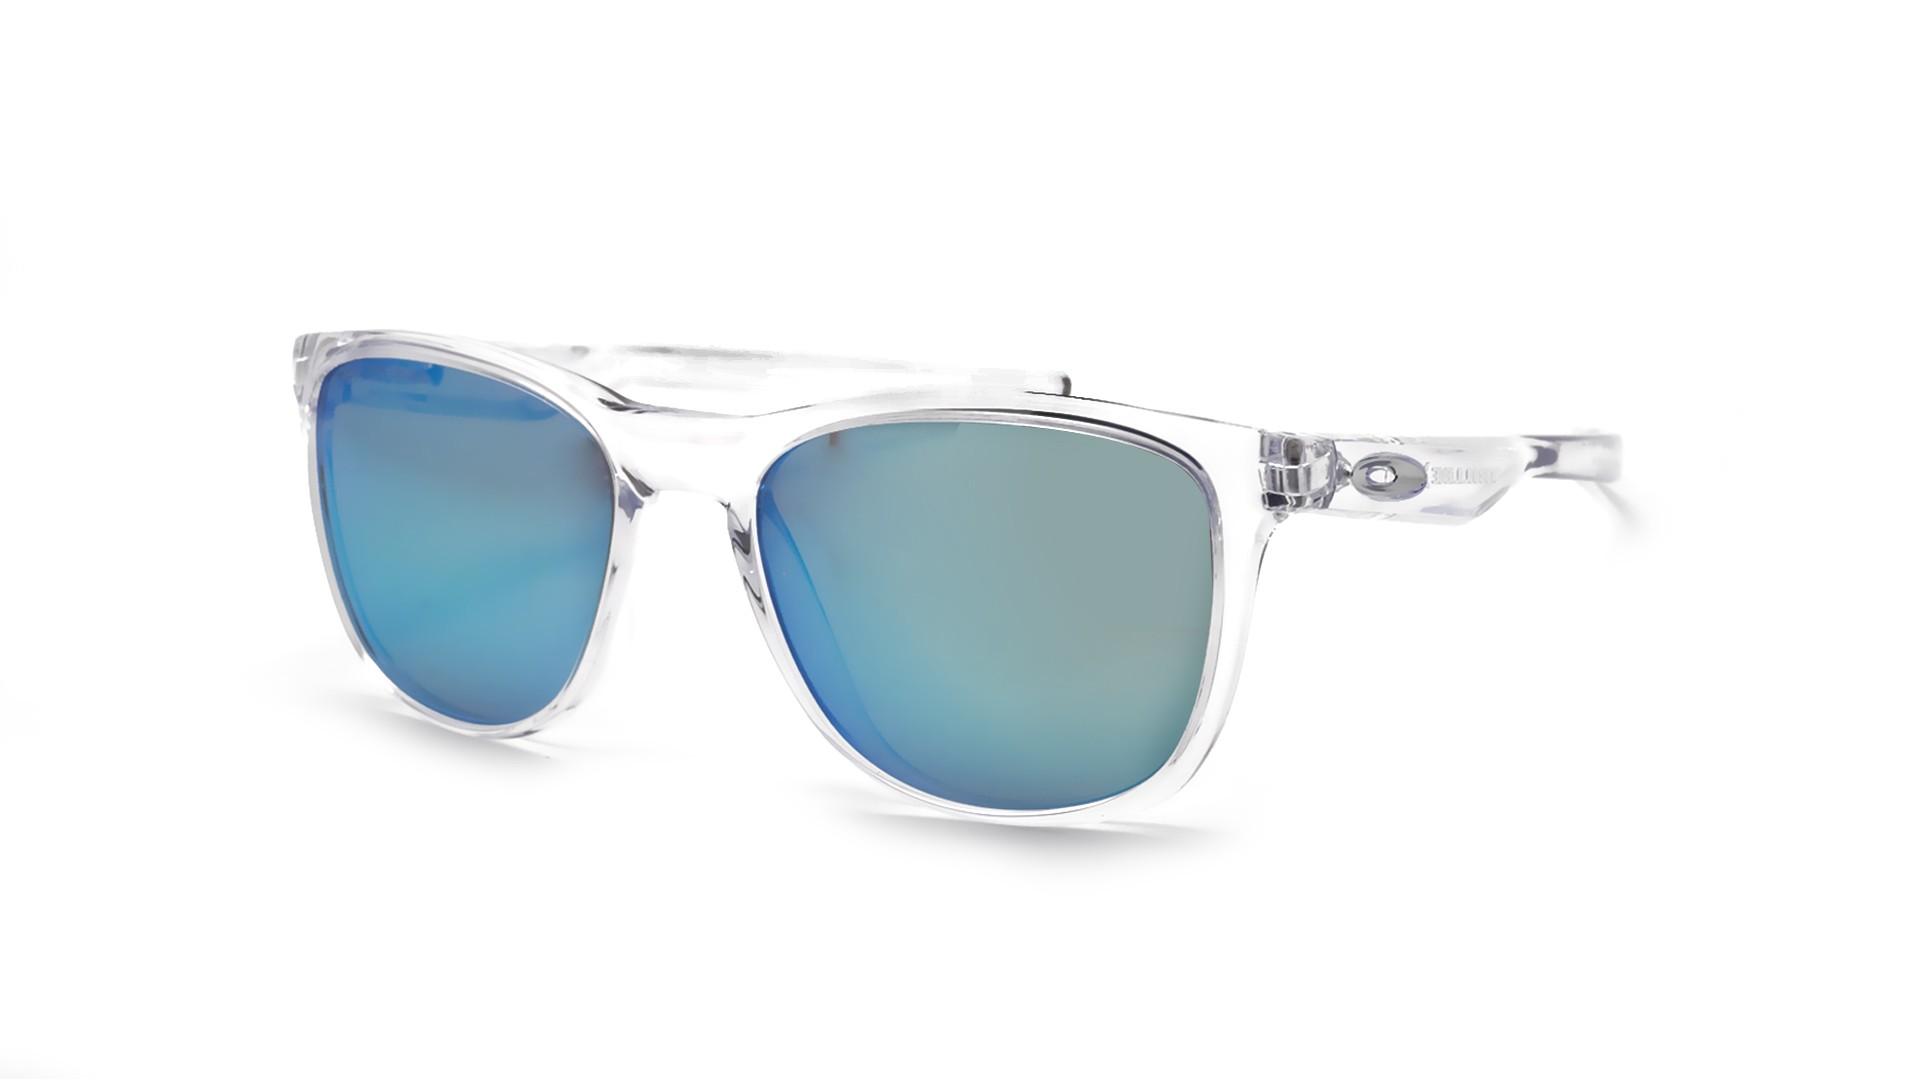 44de952dc9 Sunglasses Oakley Trillbe X Clear 009340 05 52-18 Medium Polarized Flash